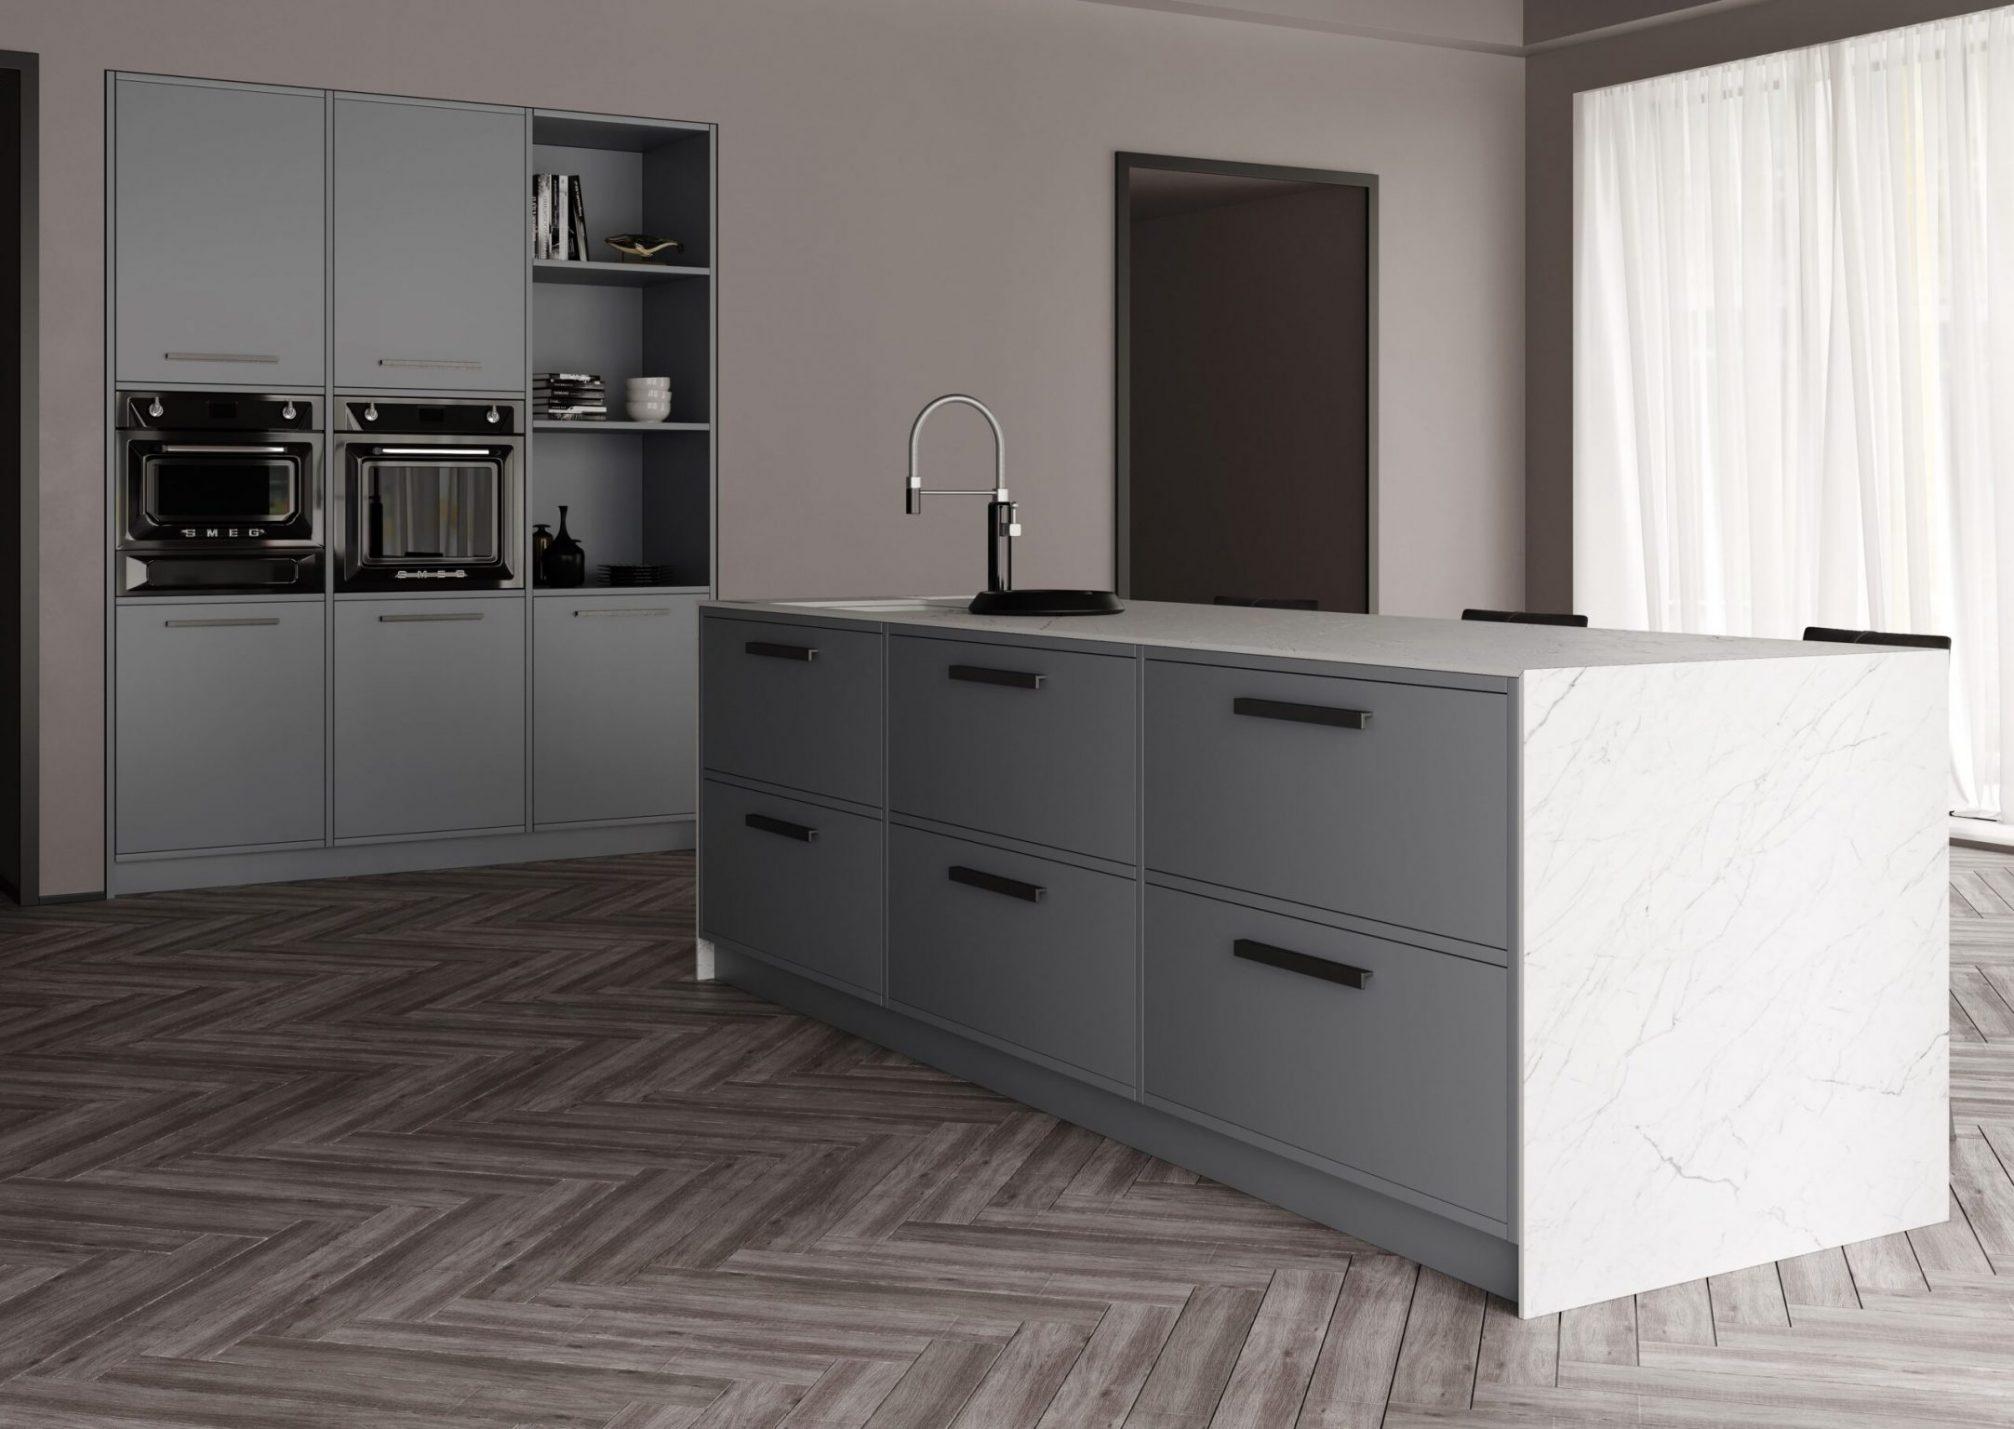 kitchen_studio_hygge_5-scaled